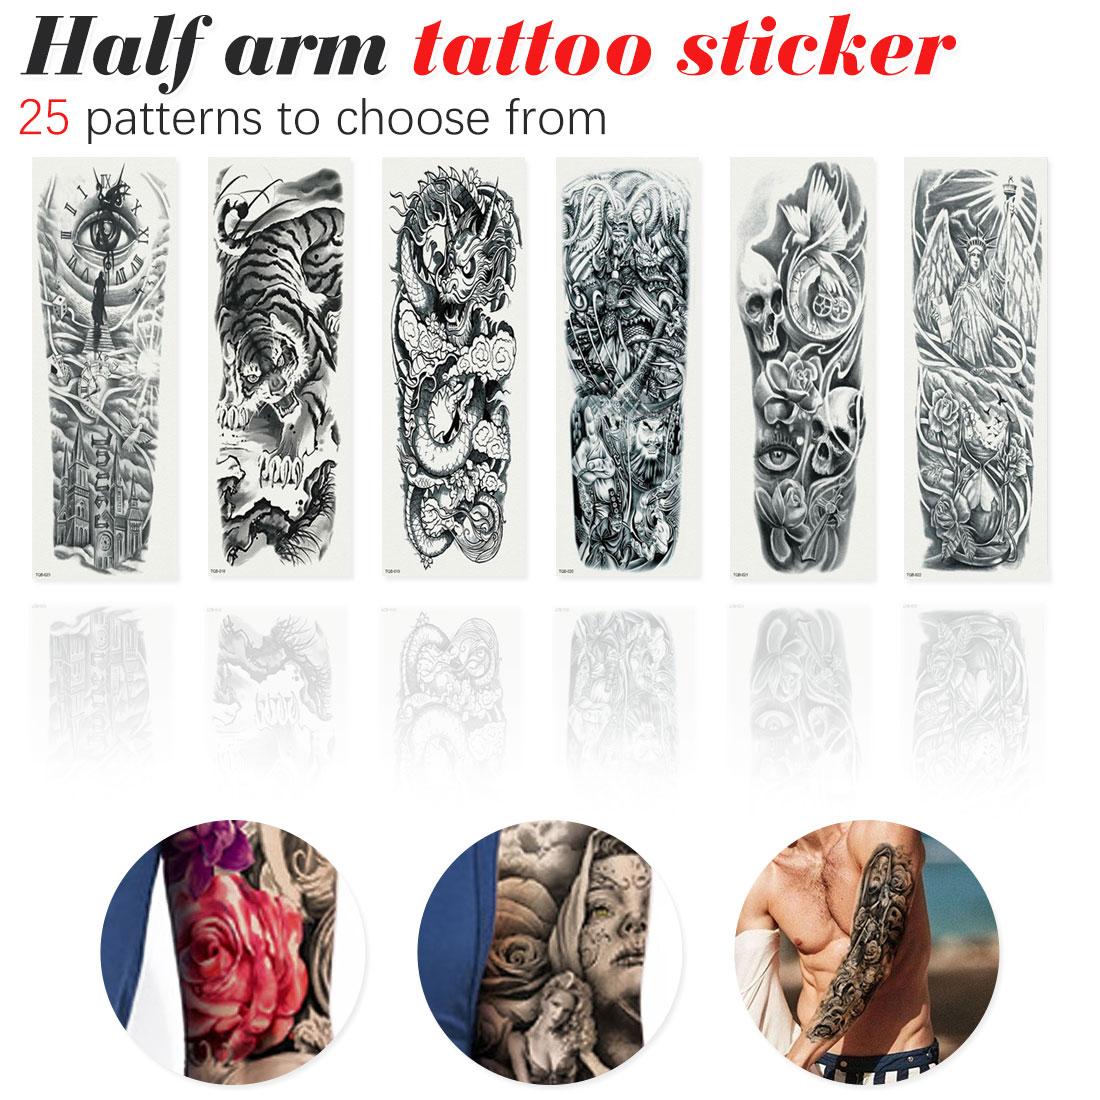 1 Uds. Tatuaje temporal a prueba de agua reloj de ojo Pagoda pájaro brazo completo tatuaje falso Flash tatuaje manga tatuaje